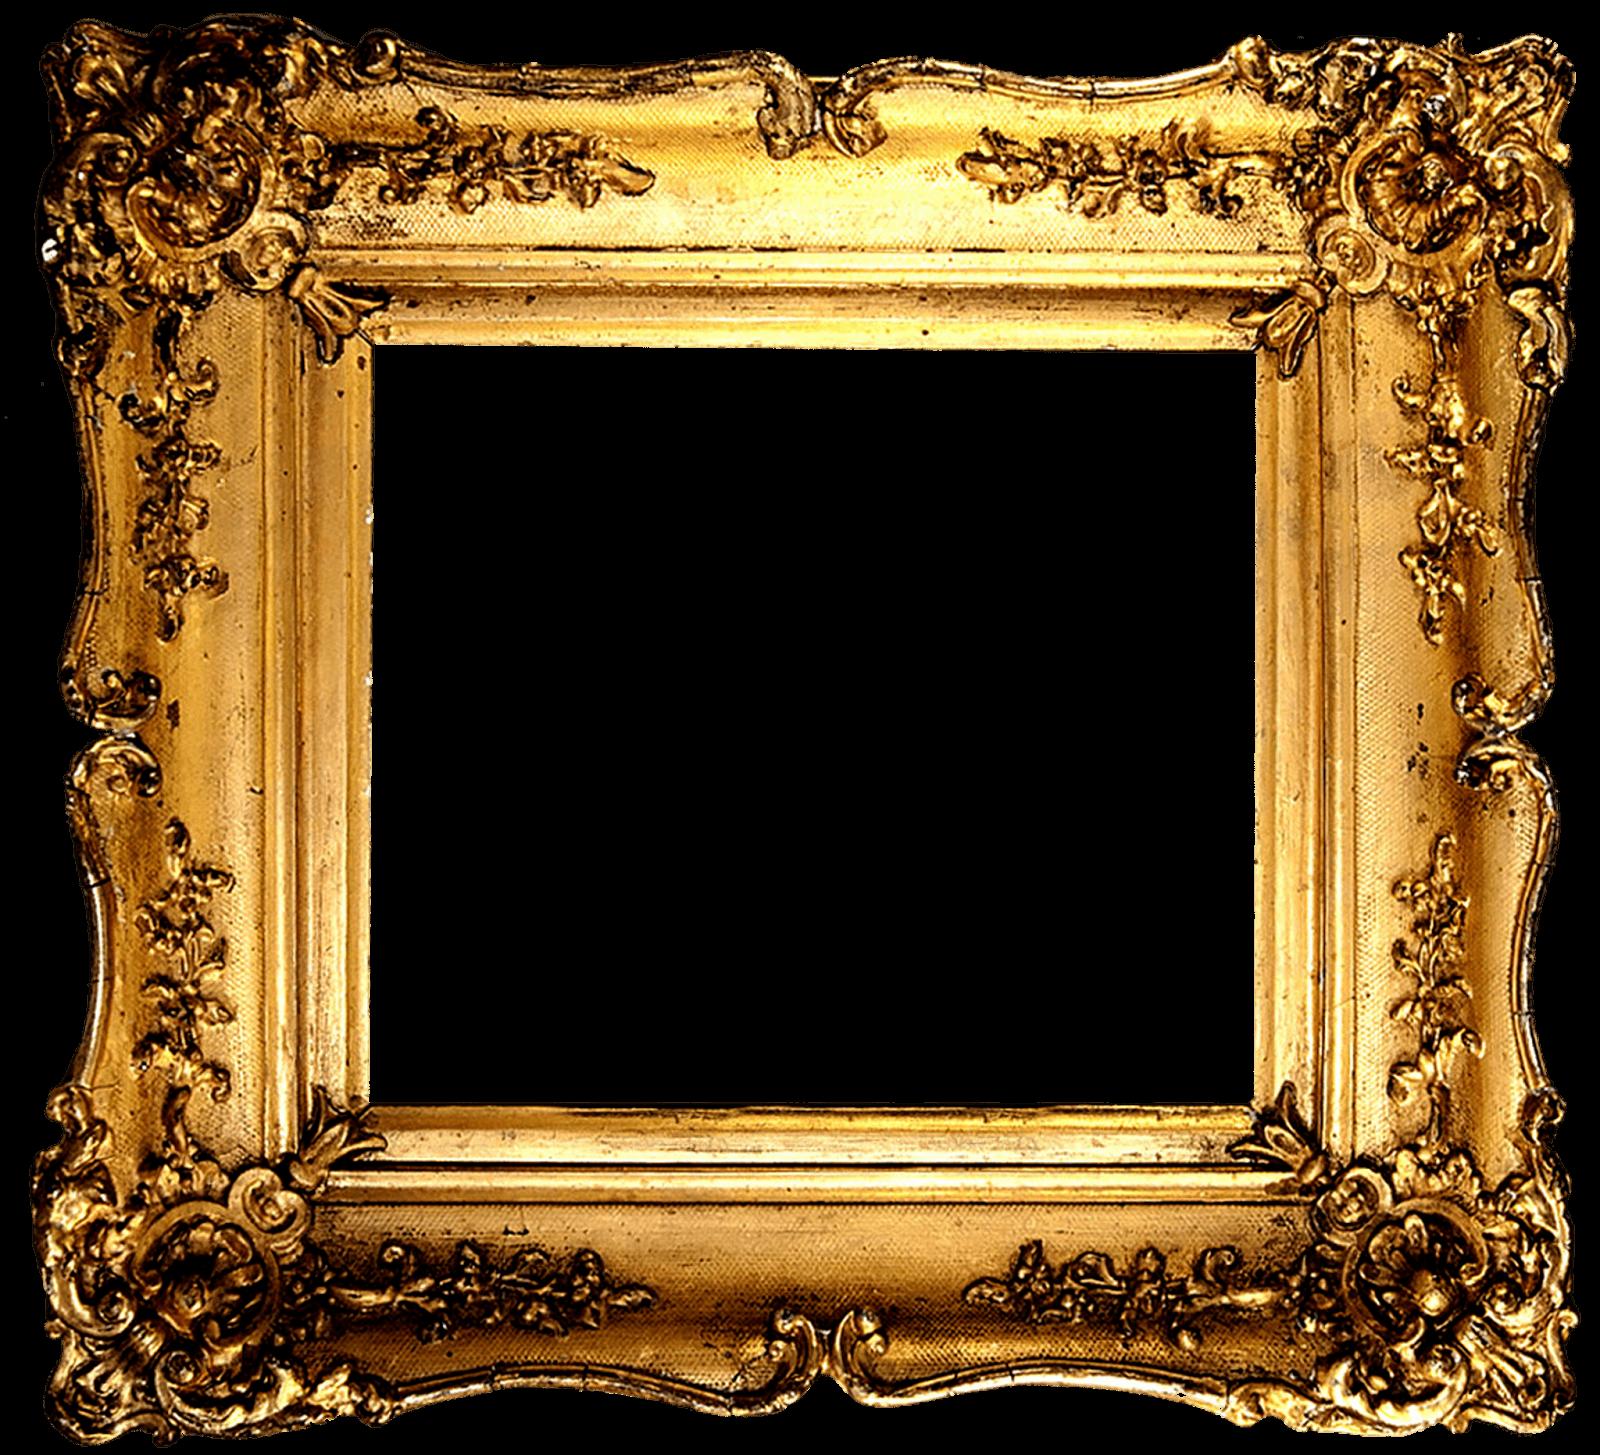 Portrait frame png. Image result for picture